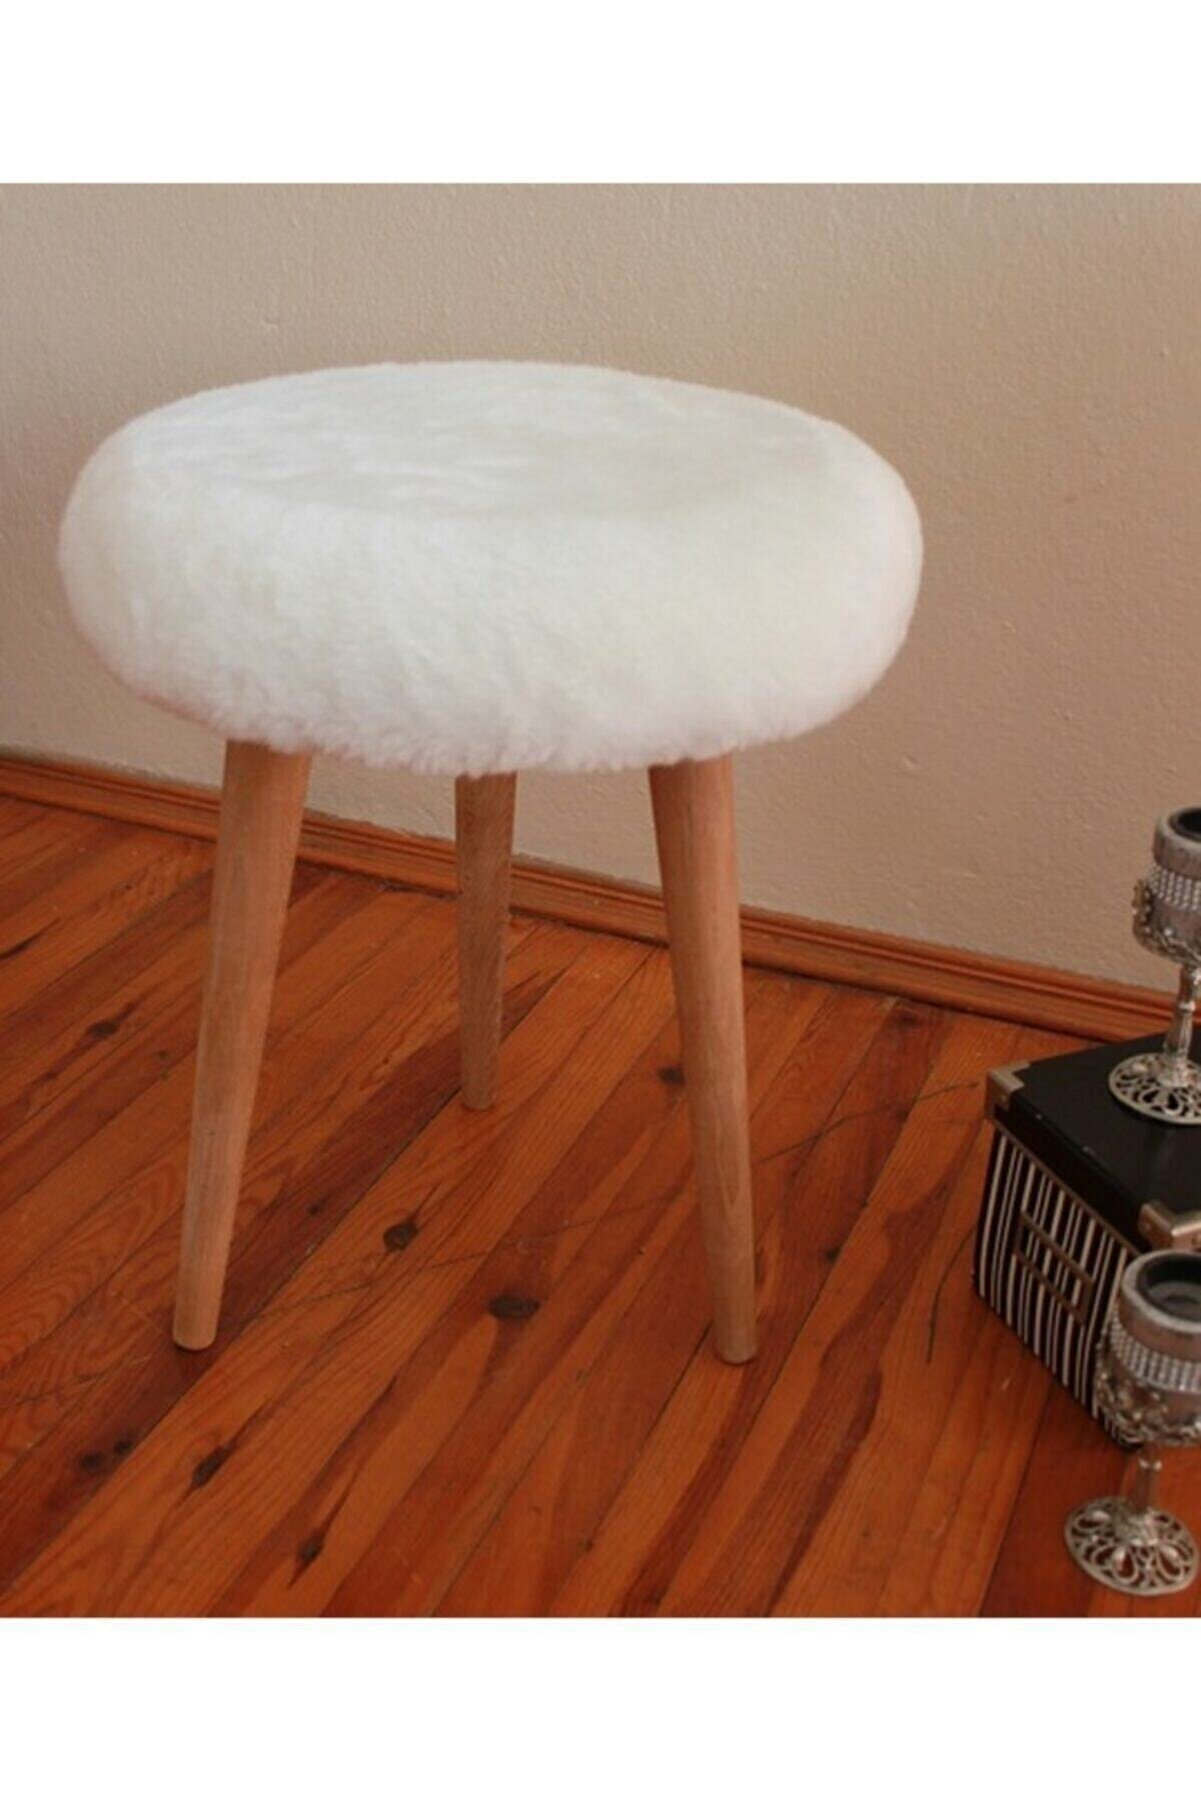 Neta Trade Neta Home Gürgen Ahşap Retro Ayak Dekoratif Beyaz Peluş Puf Tabure Bench Koltuk Sandalye